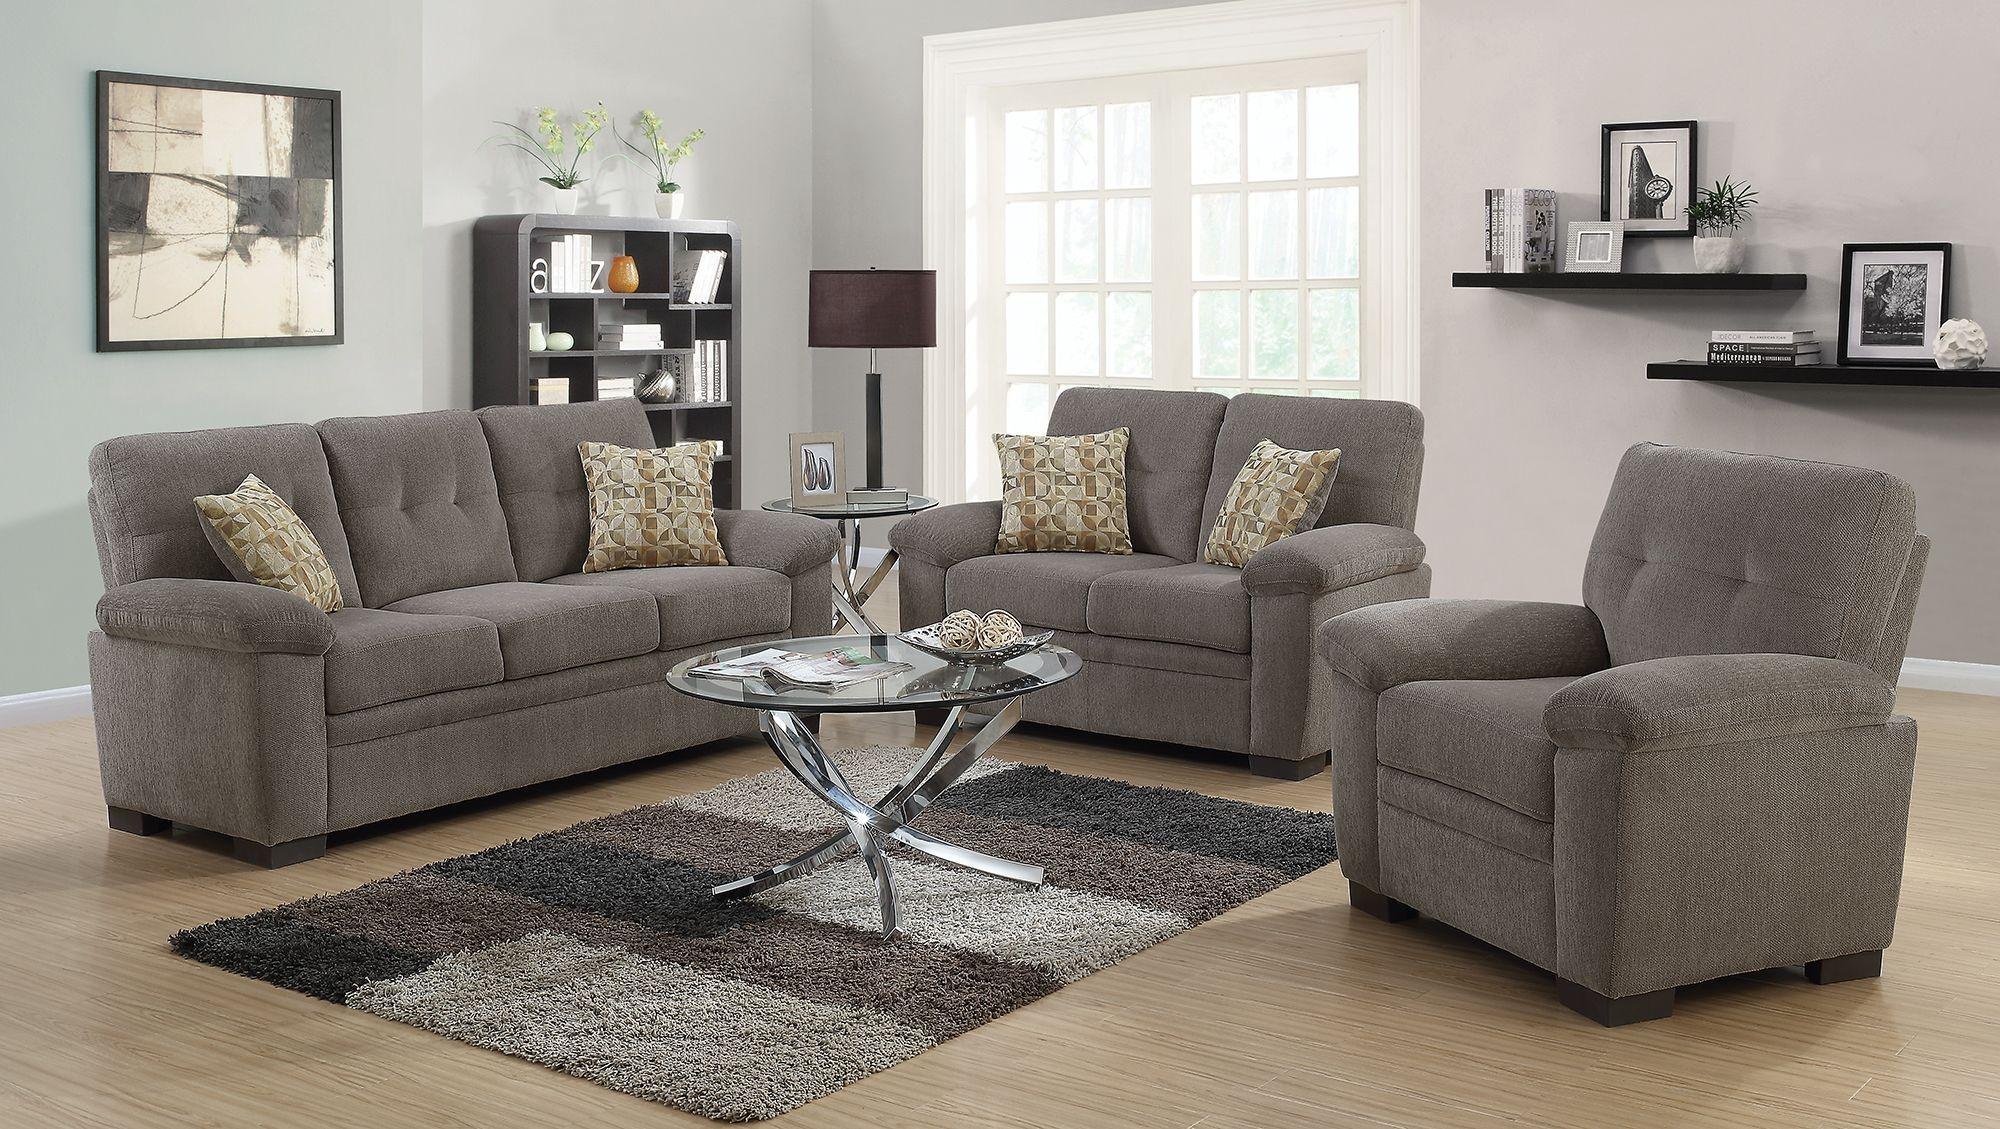 oatmeal sofa set leather conditioner india fairbairn living room 506581 82 coaster